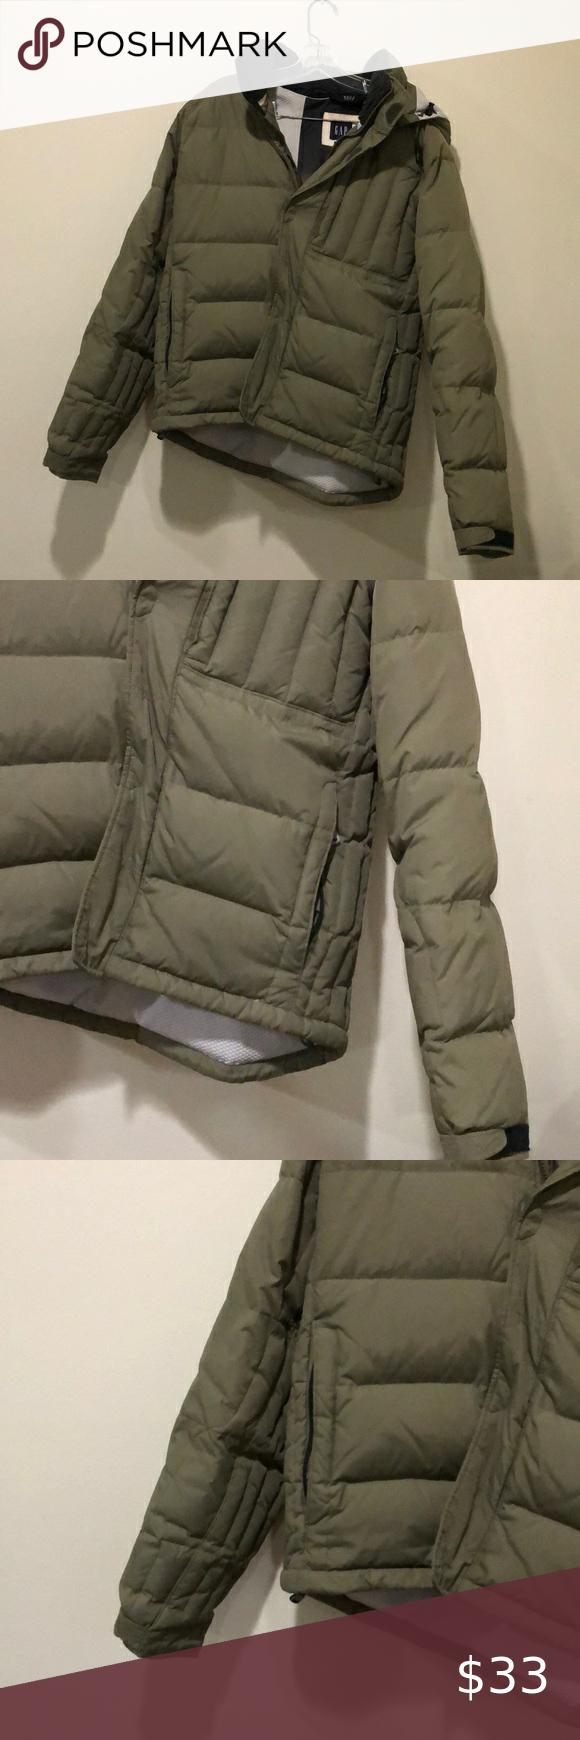 Gap Mens Winter Puffer Jacket Olive Green Winter Puffer Jackets Puffer Jackets Green Puffer Jacket [ 1740 x 580 Pixel ]